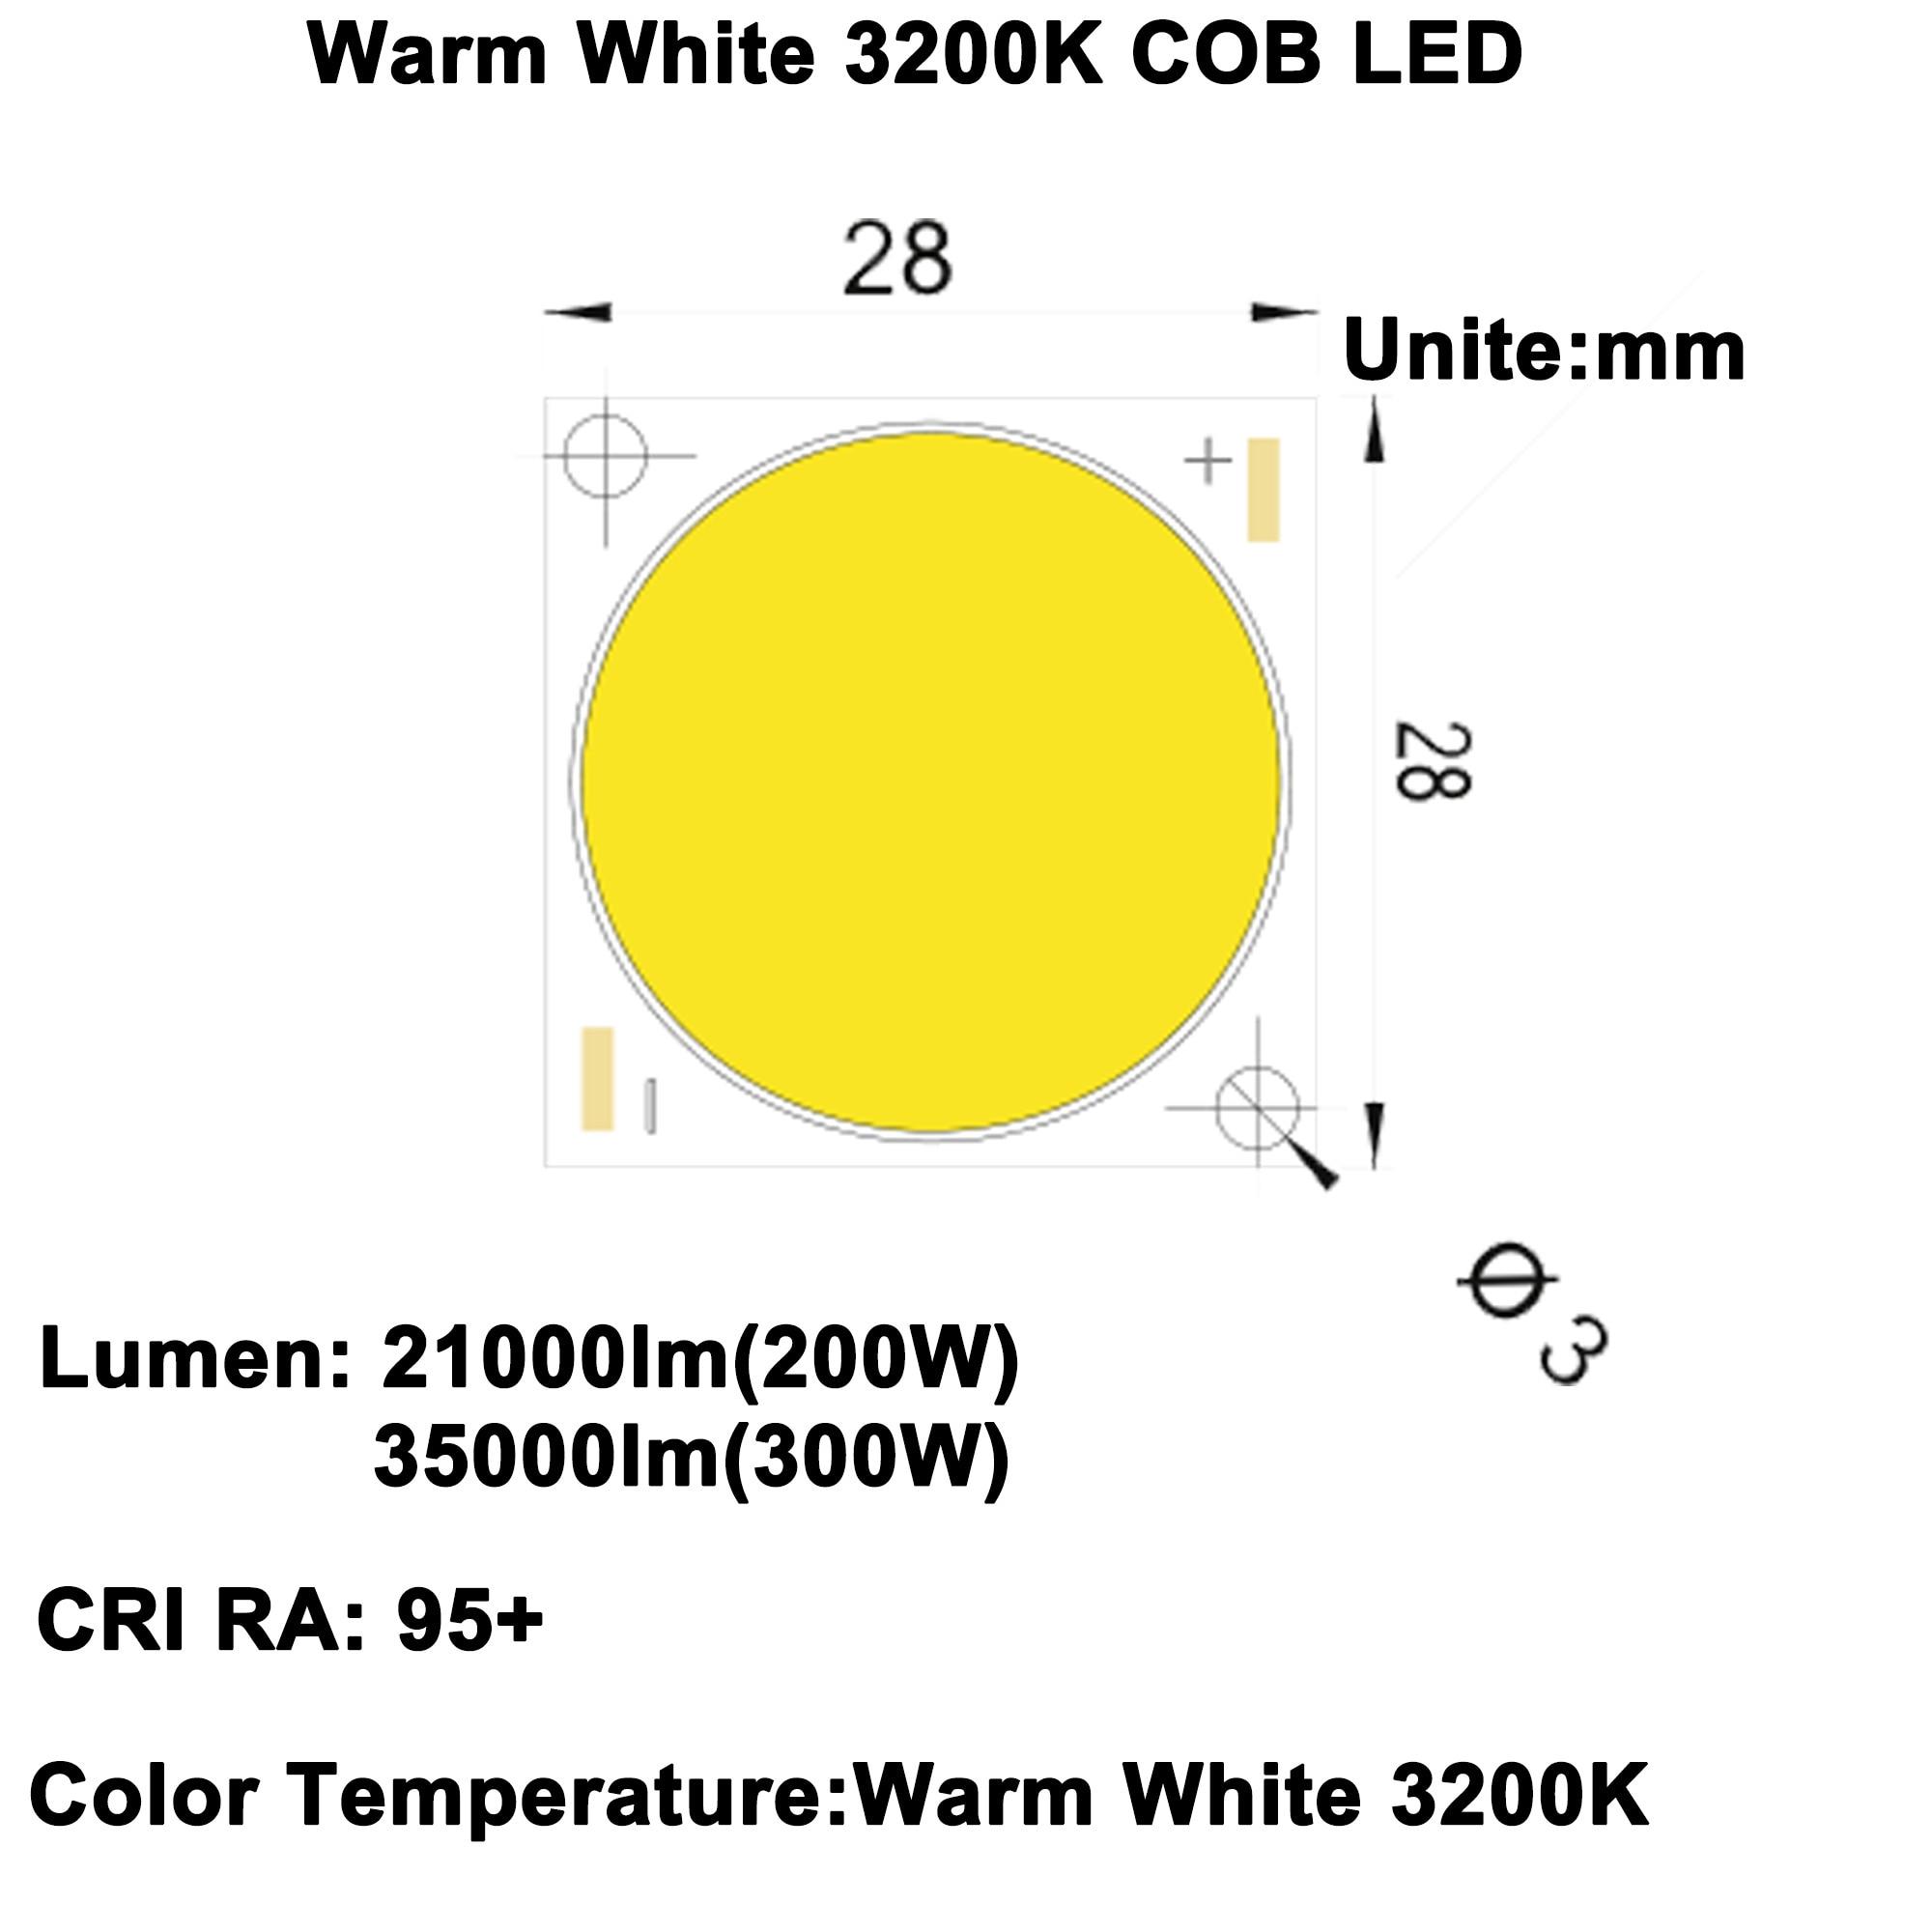 High CRI RA 95+ High Power Density Citizen LED Chip 300W COB LED Warm White 3200K DC47.8 56.2V 5750mA 30000lm 35000lm LED Spotlights     - title=